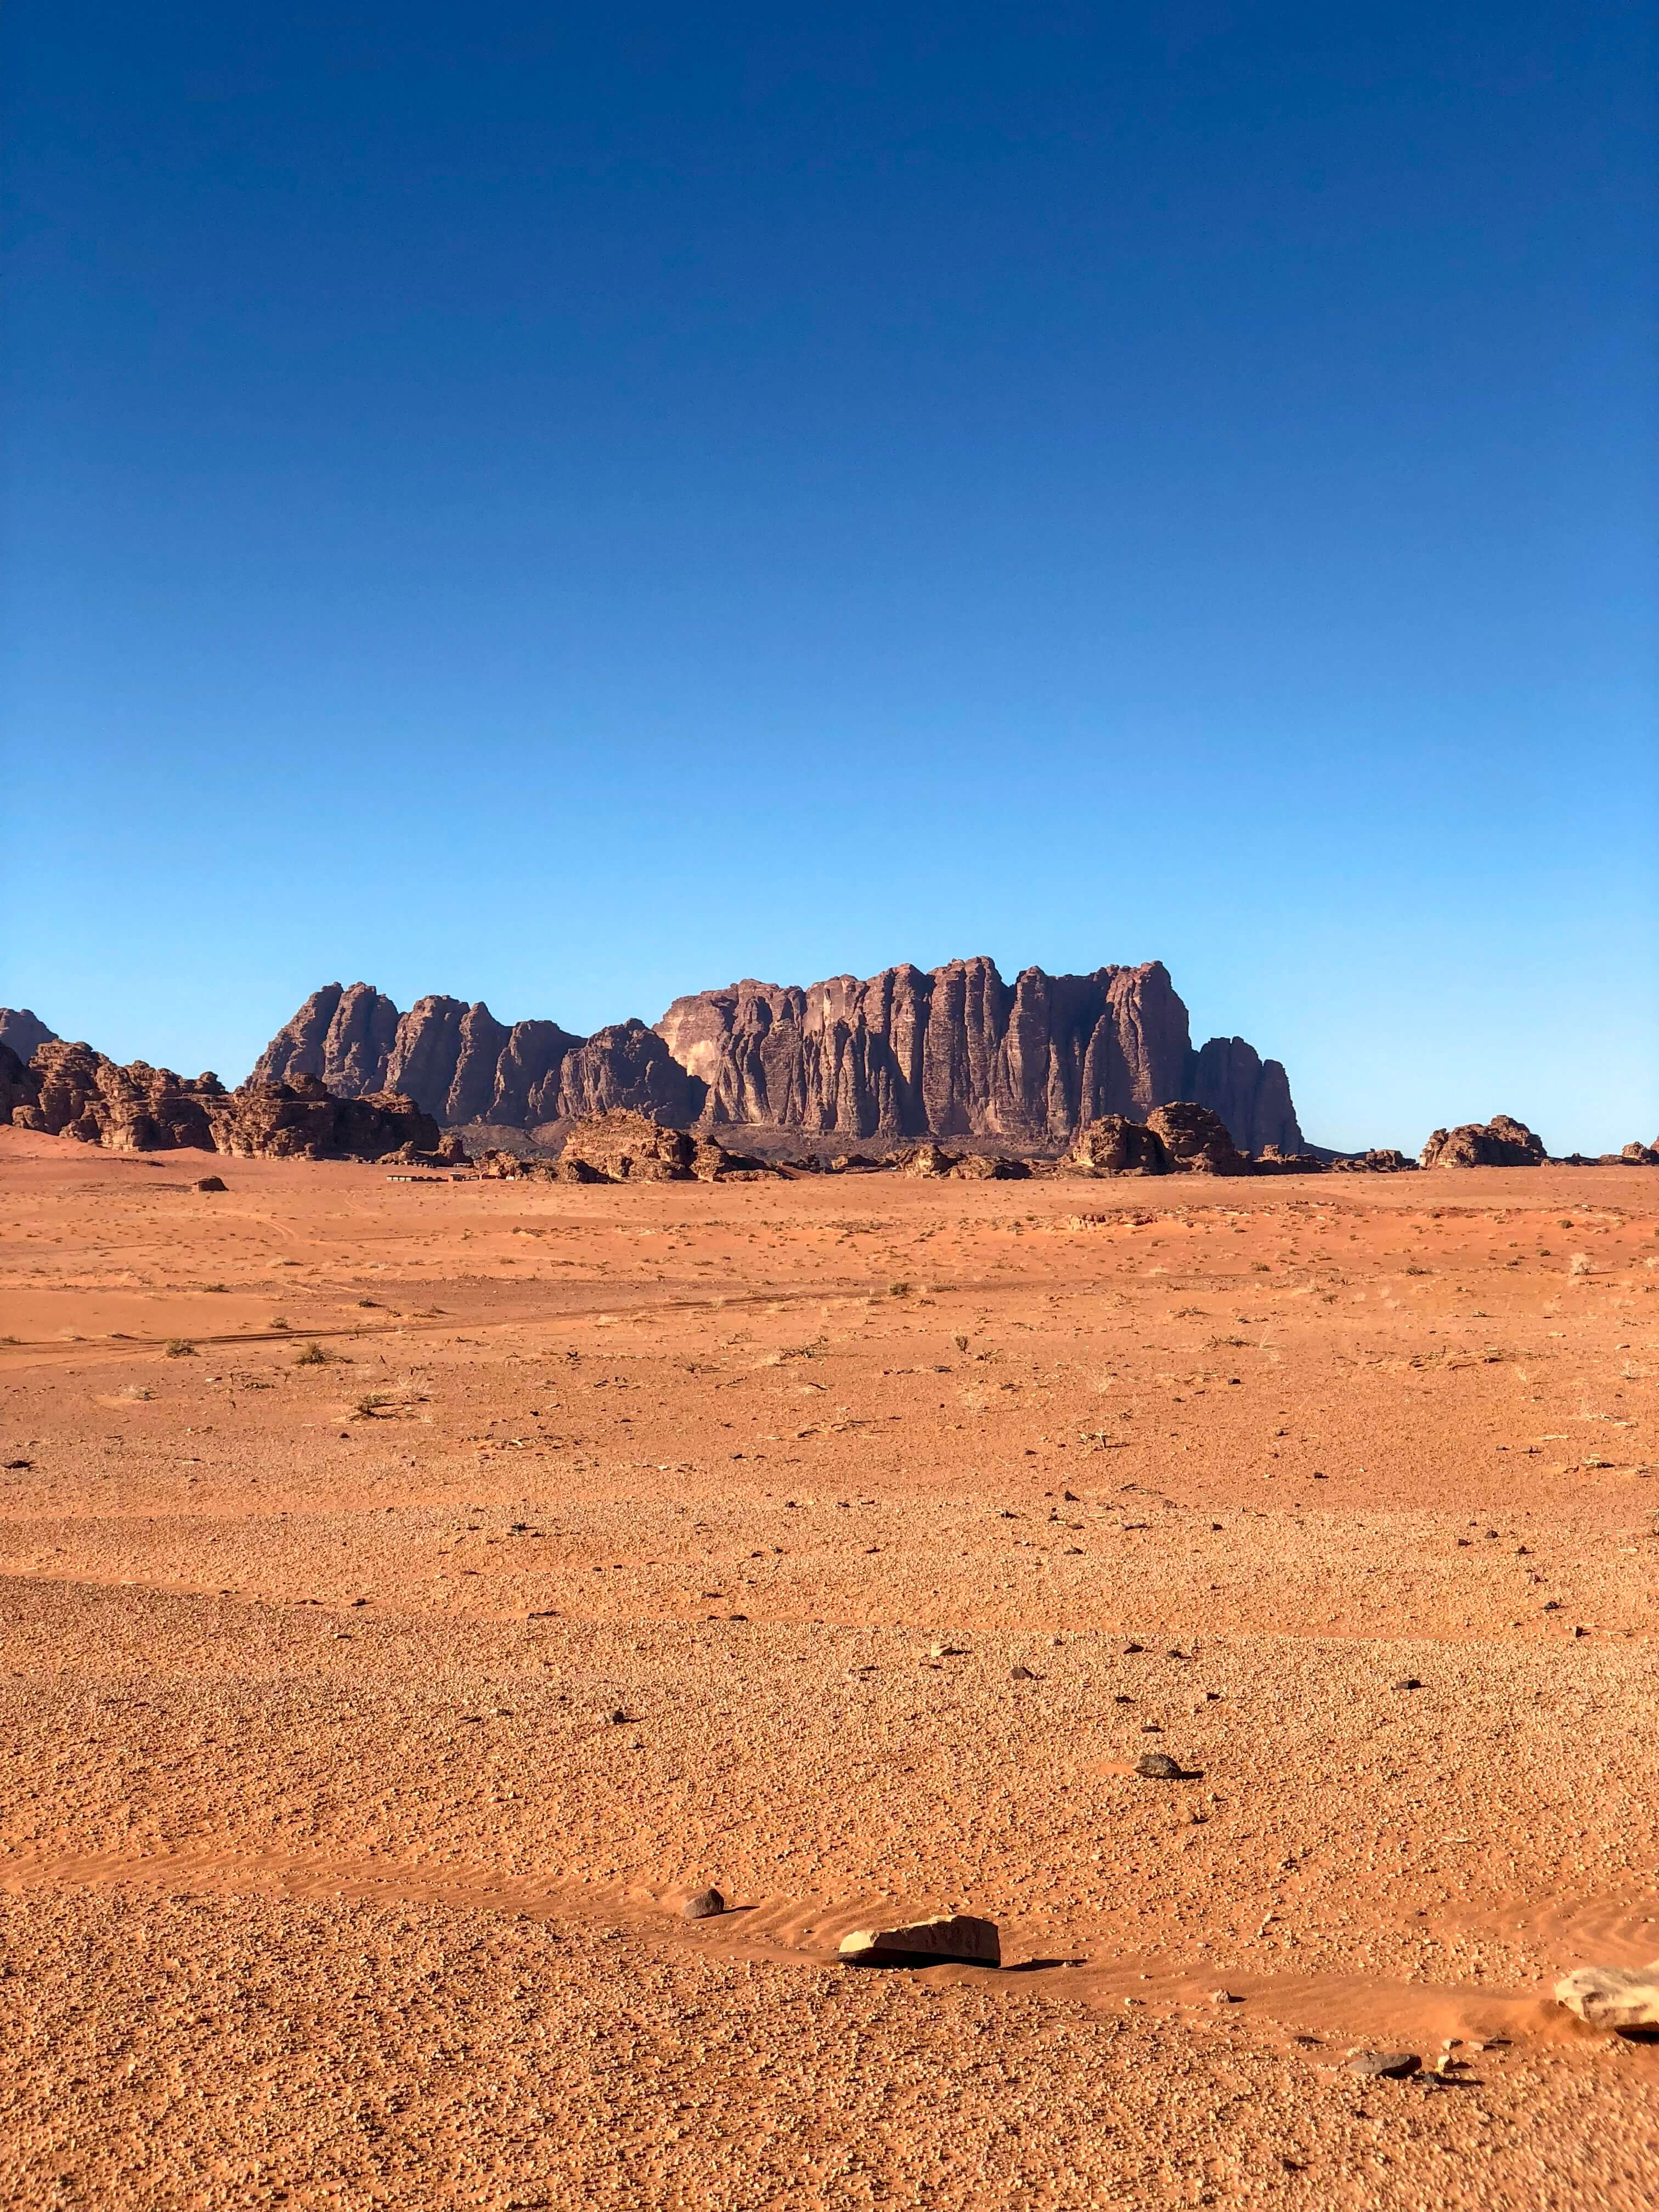 Jabal Al Qattar